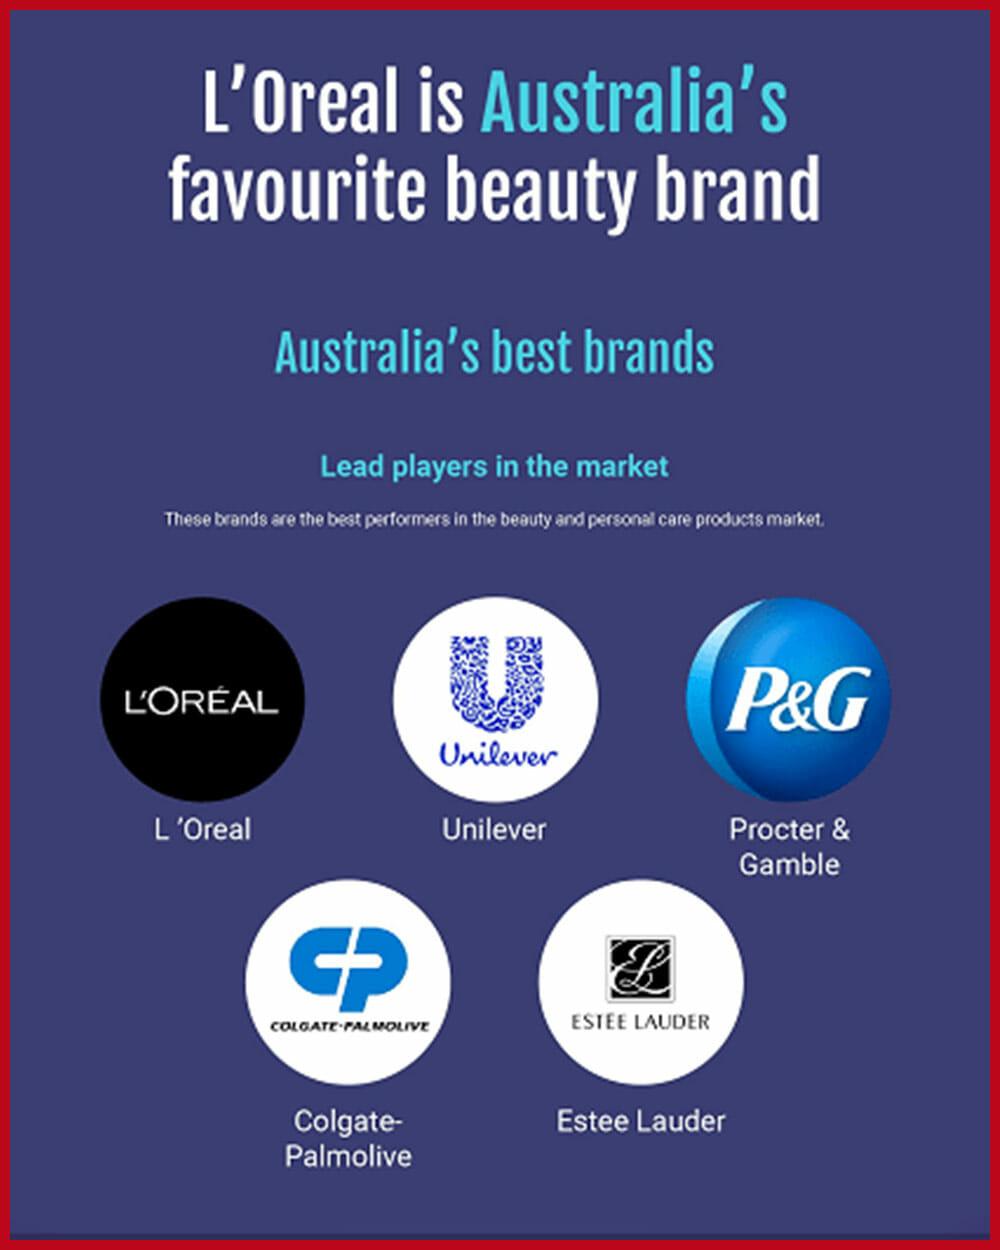 Australian's favourite beauty brand